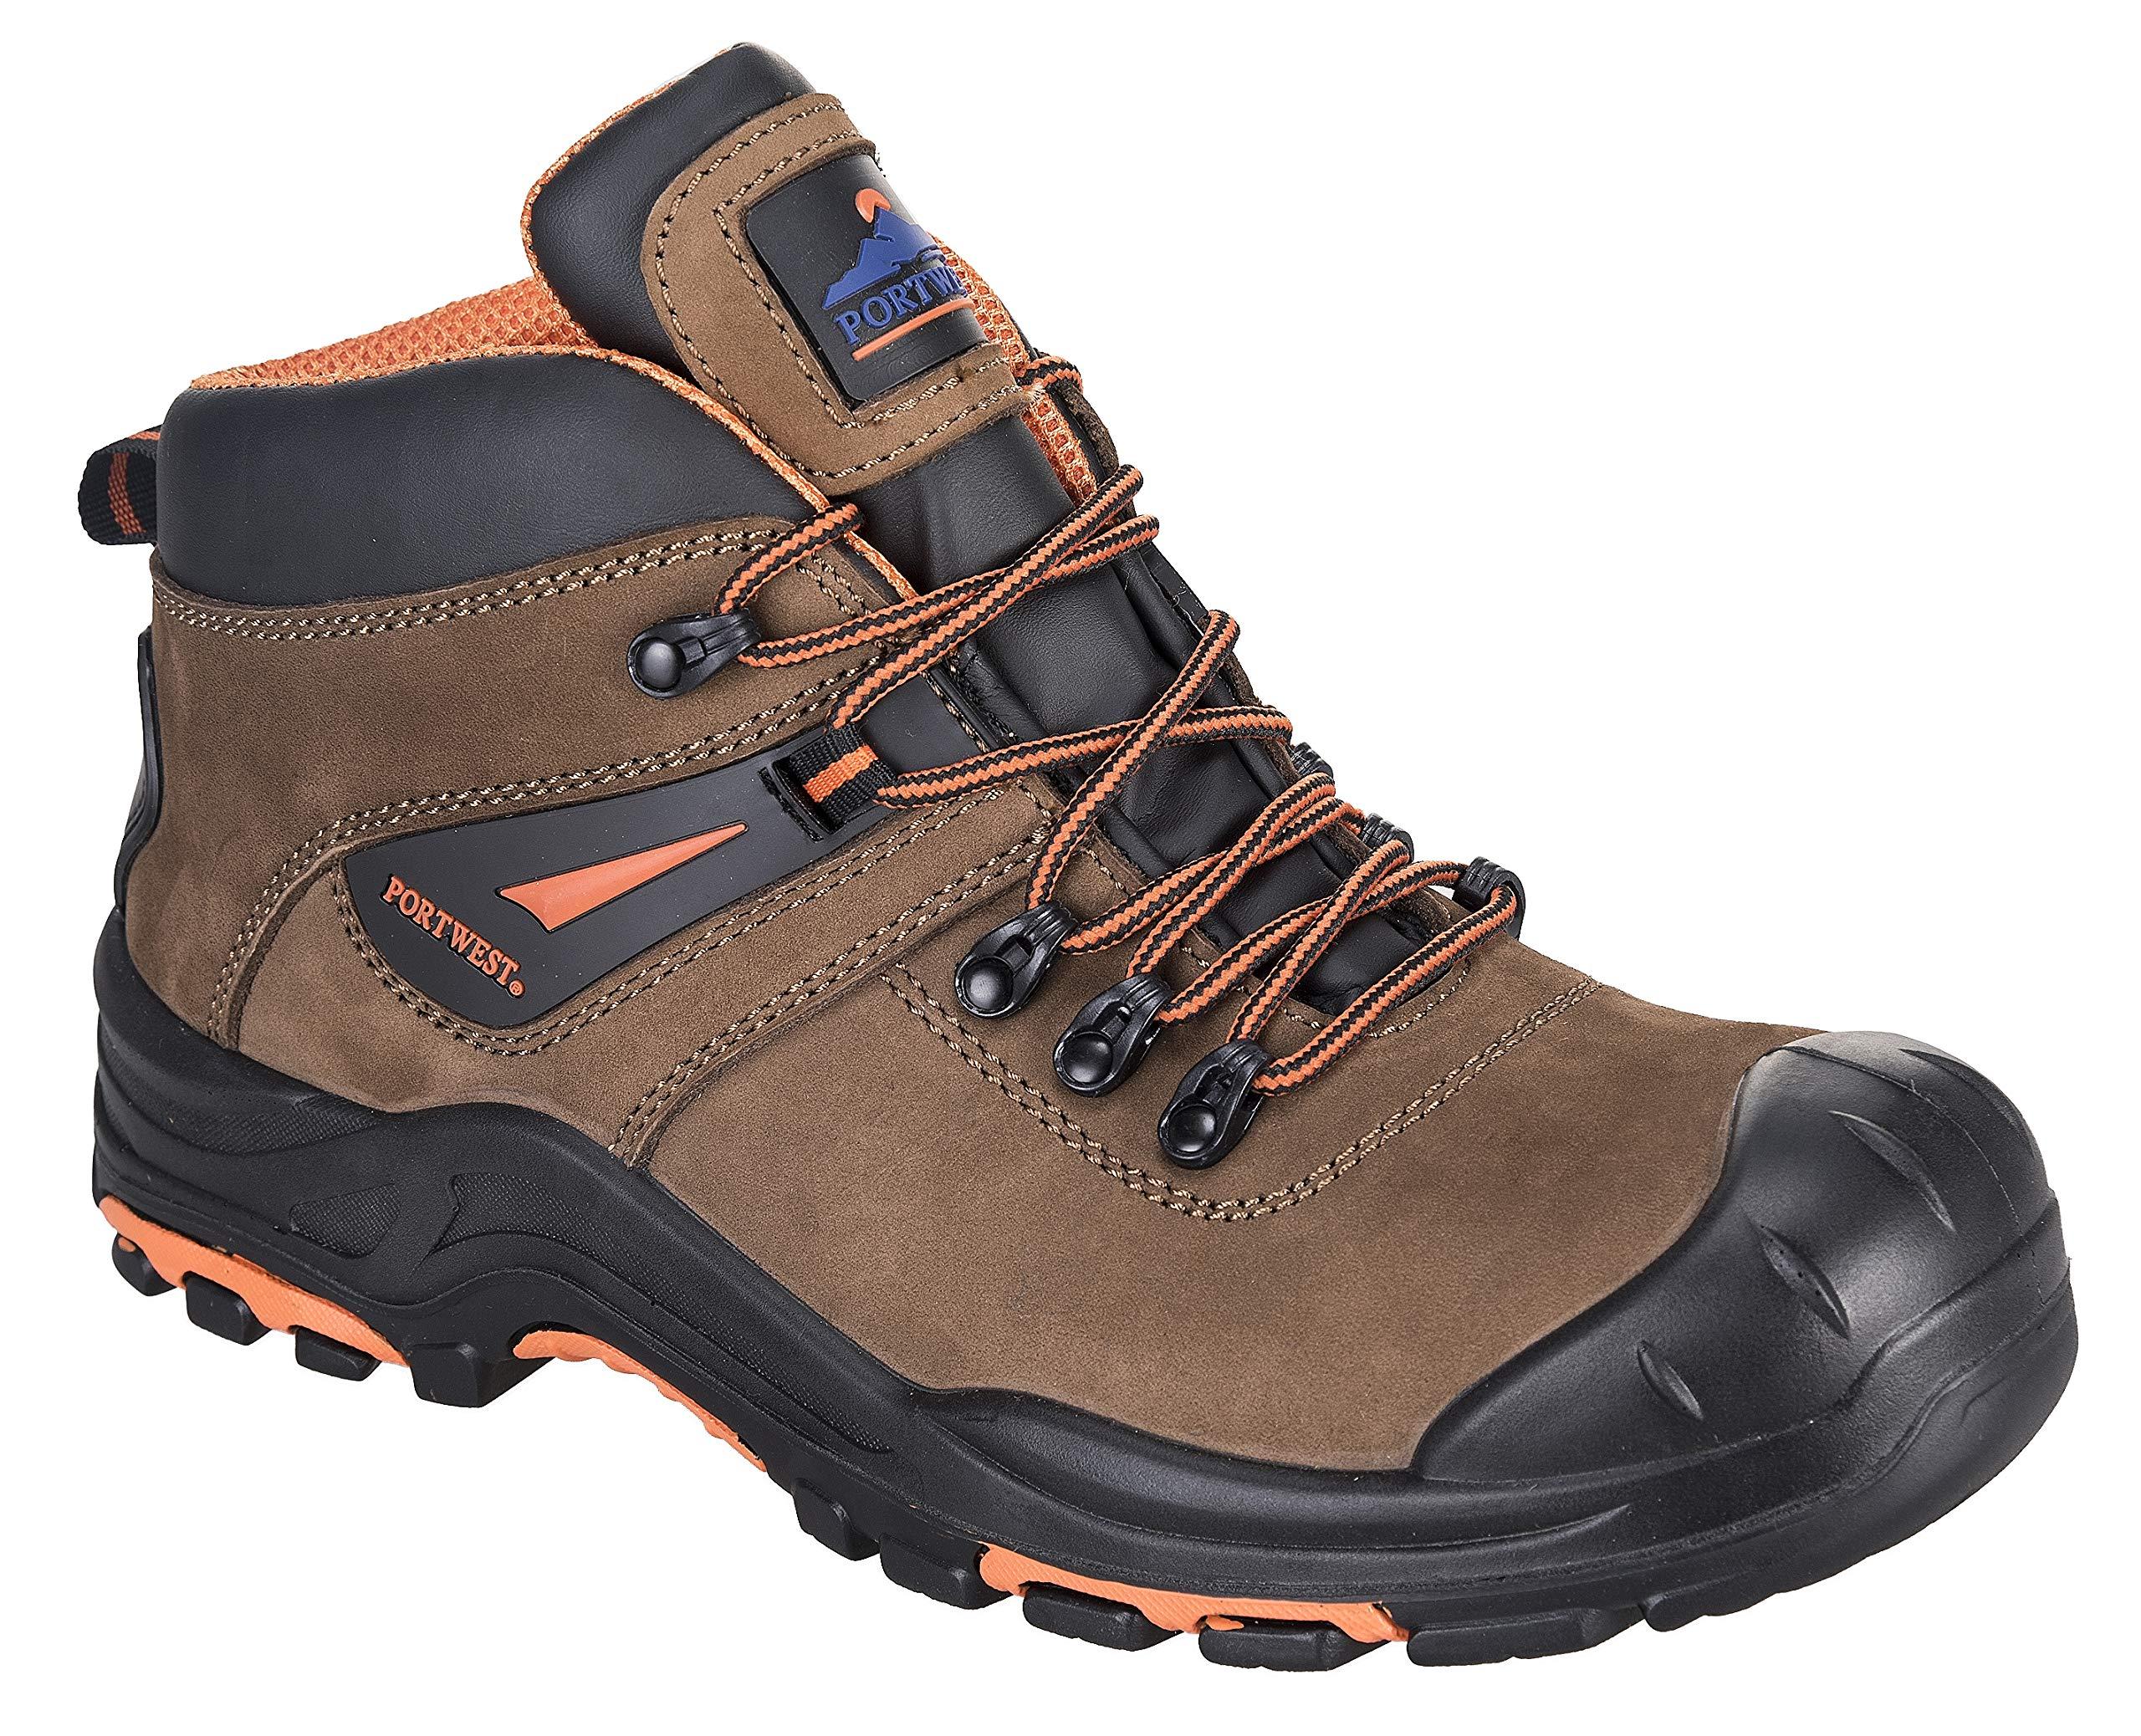 Portwest Montana Hiker Boot HROEH Steel Toe Cap Protective Work Wear Heat Resistant, 7.5